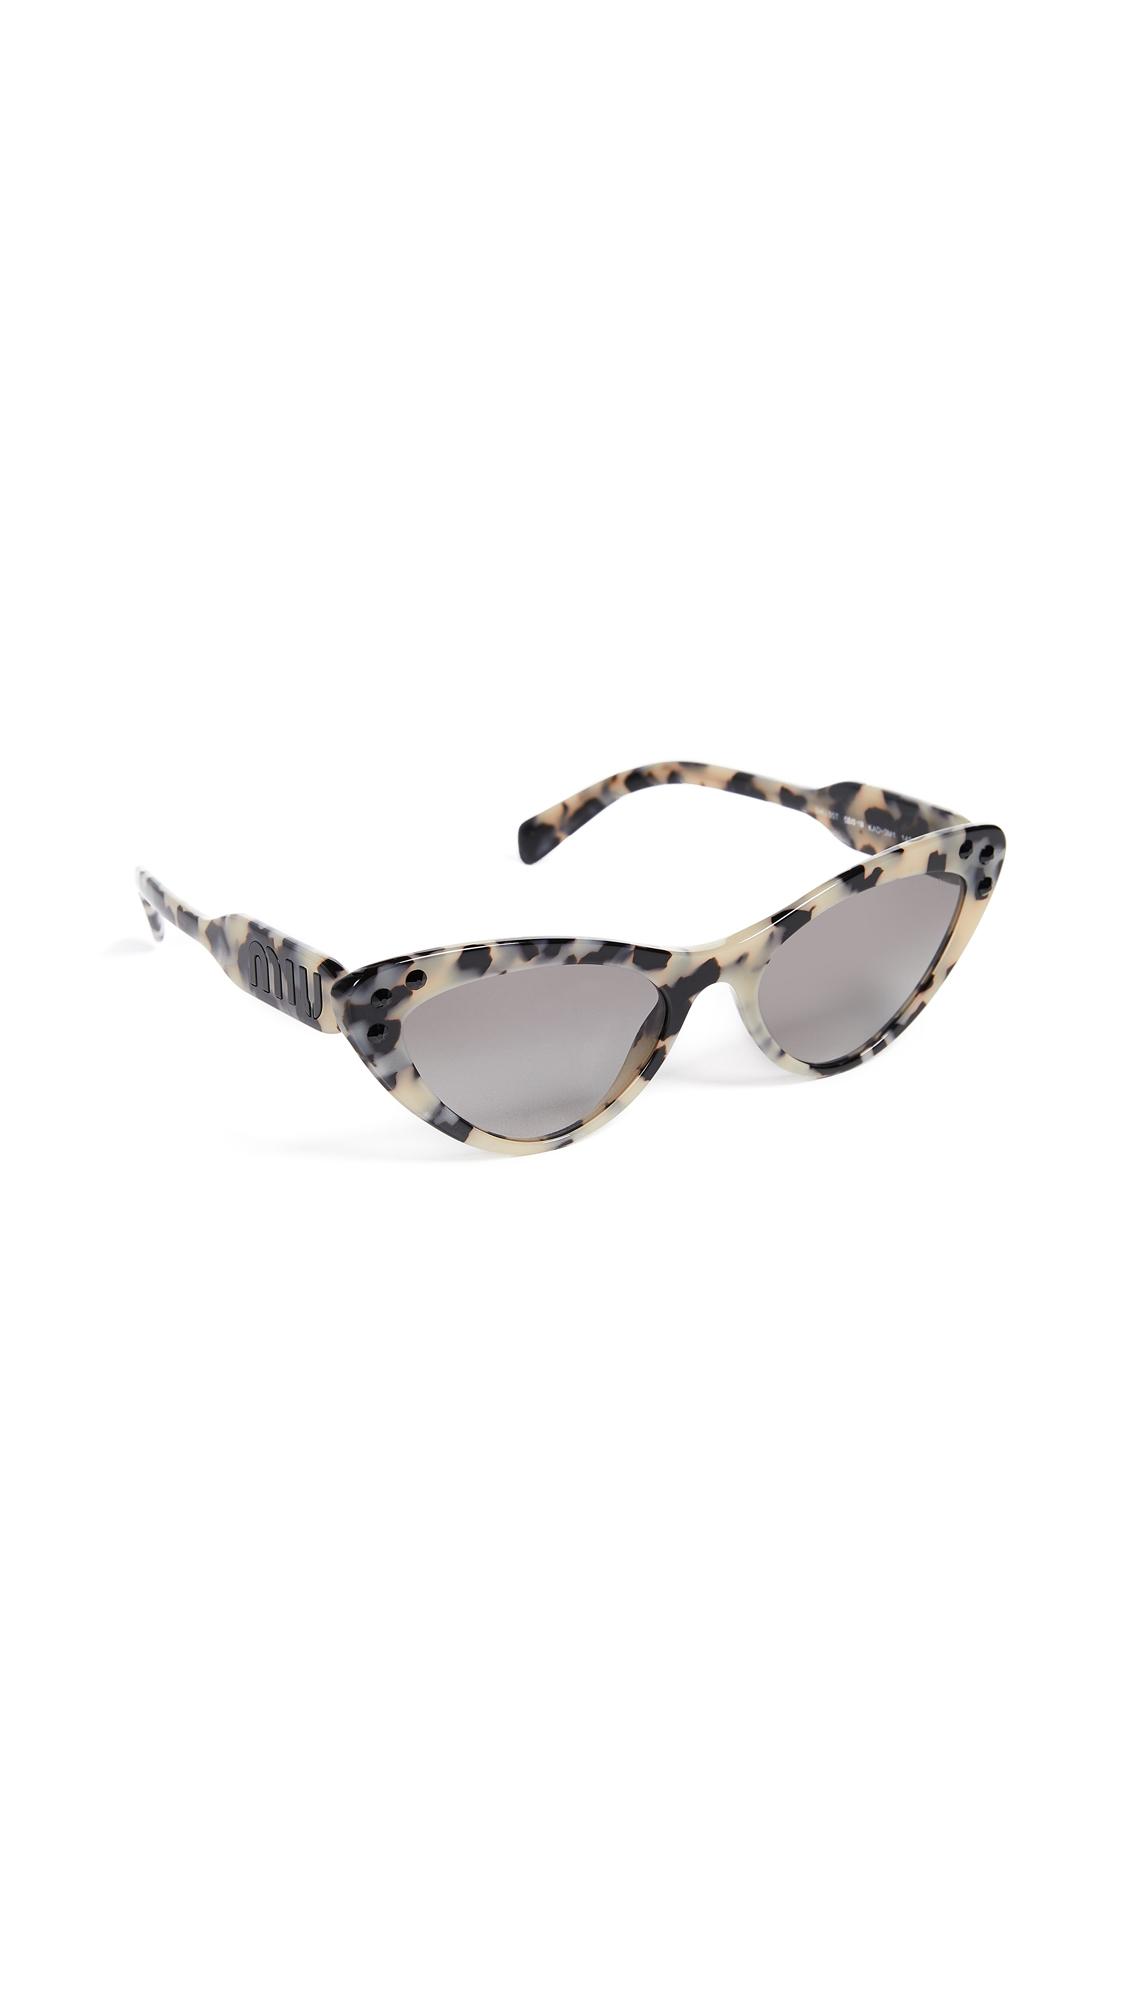 Crystals Cat Eye Sunglasses, Sand Havana Moro/Grey Gradient